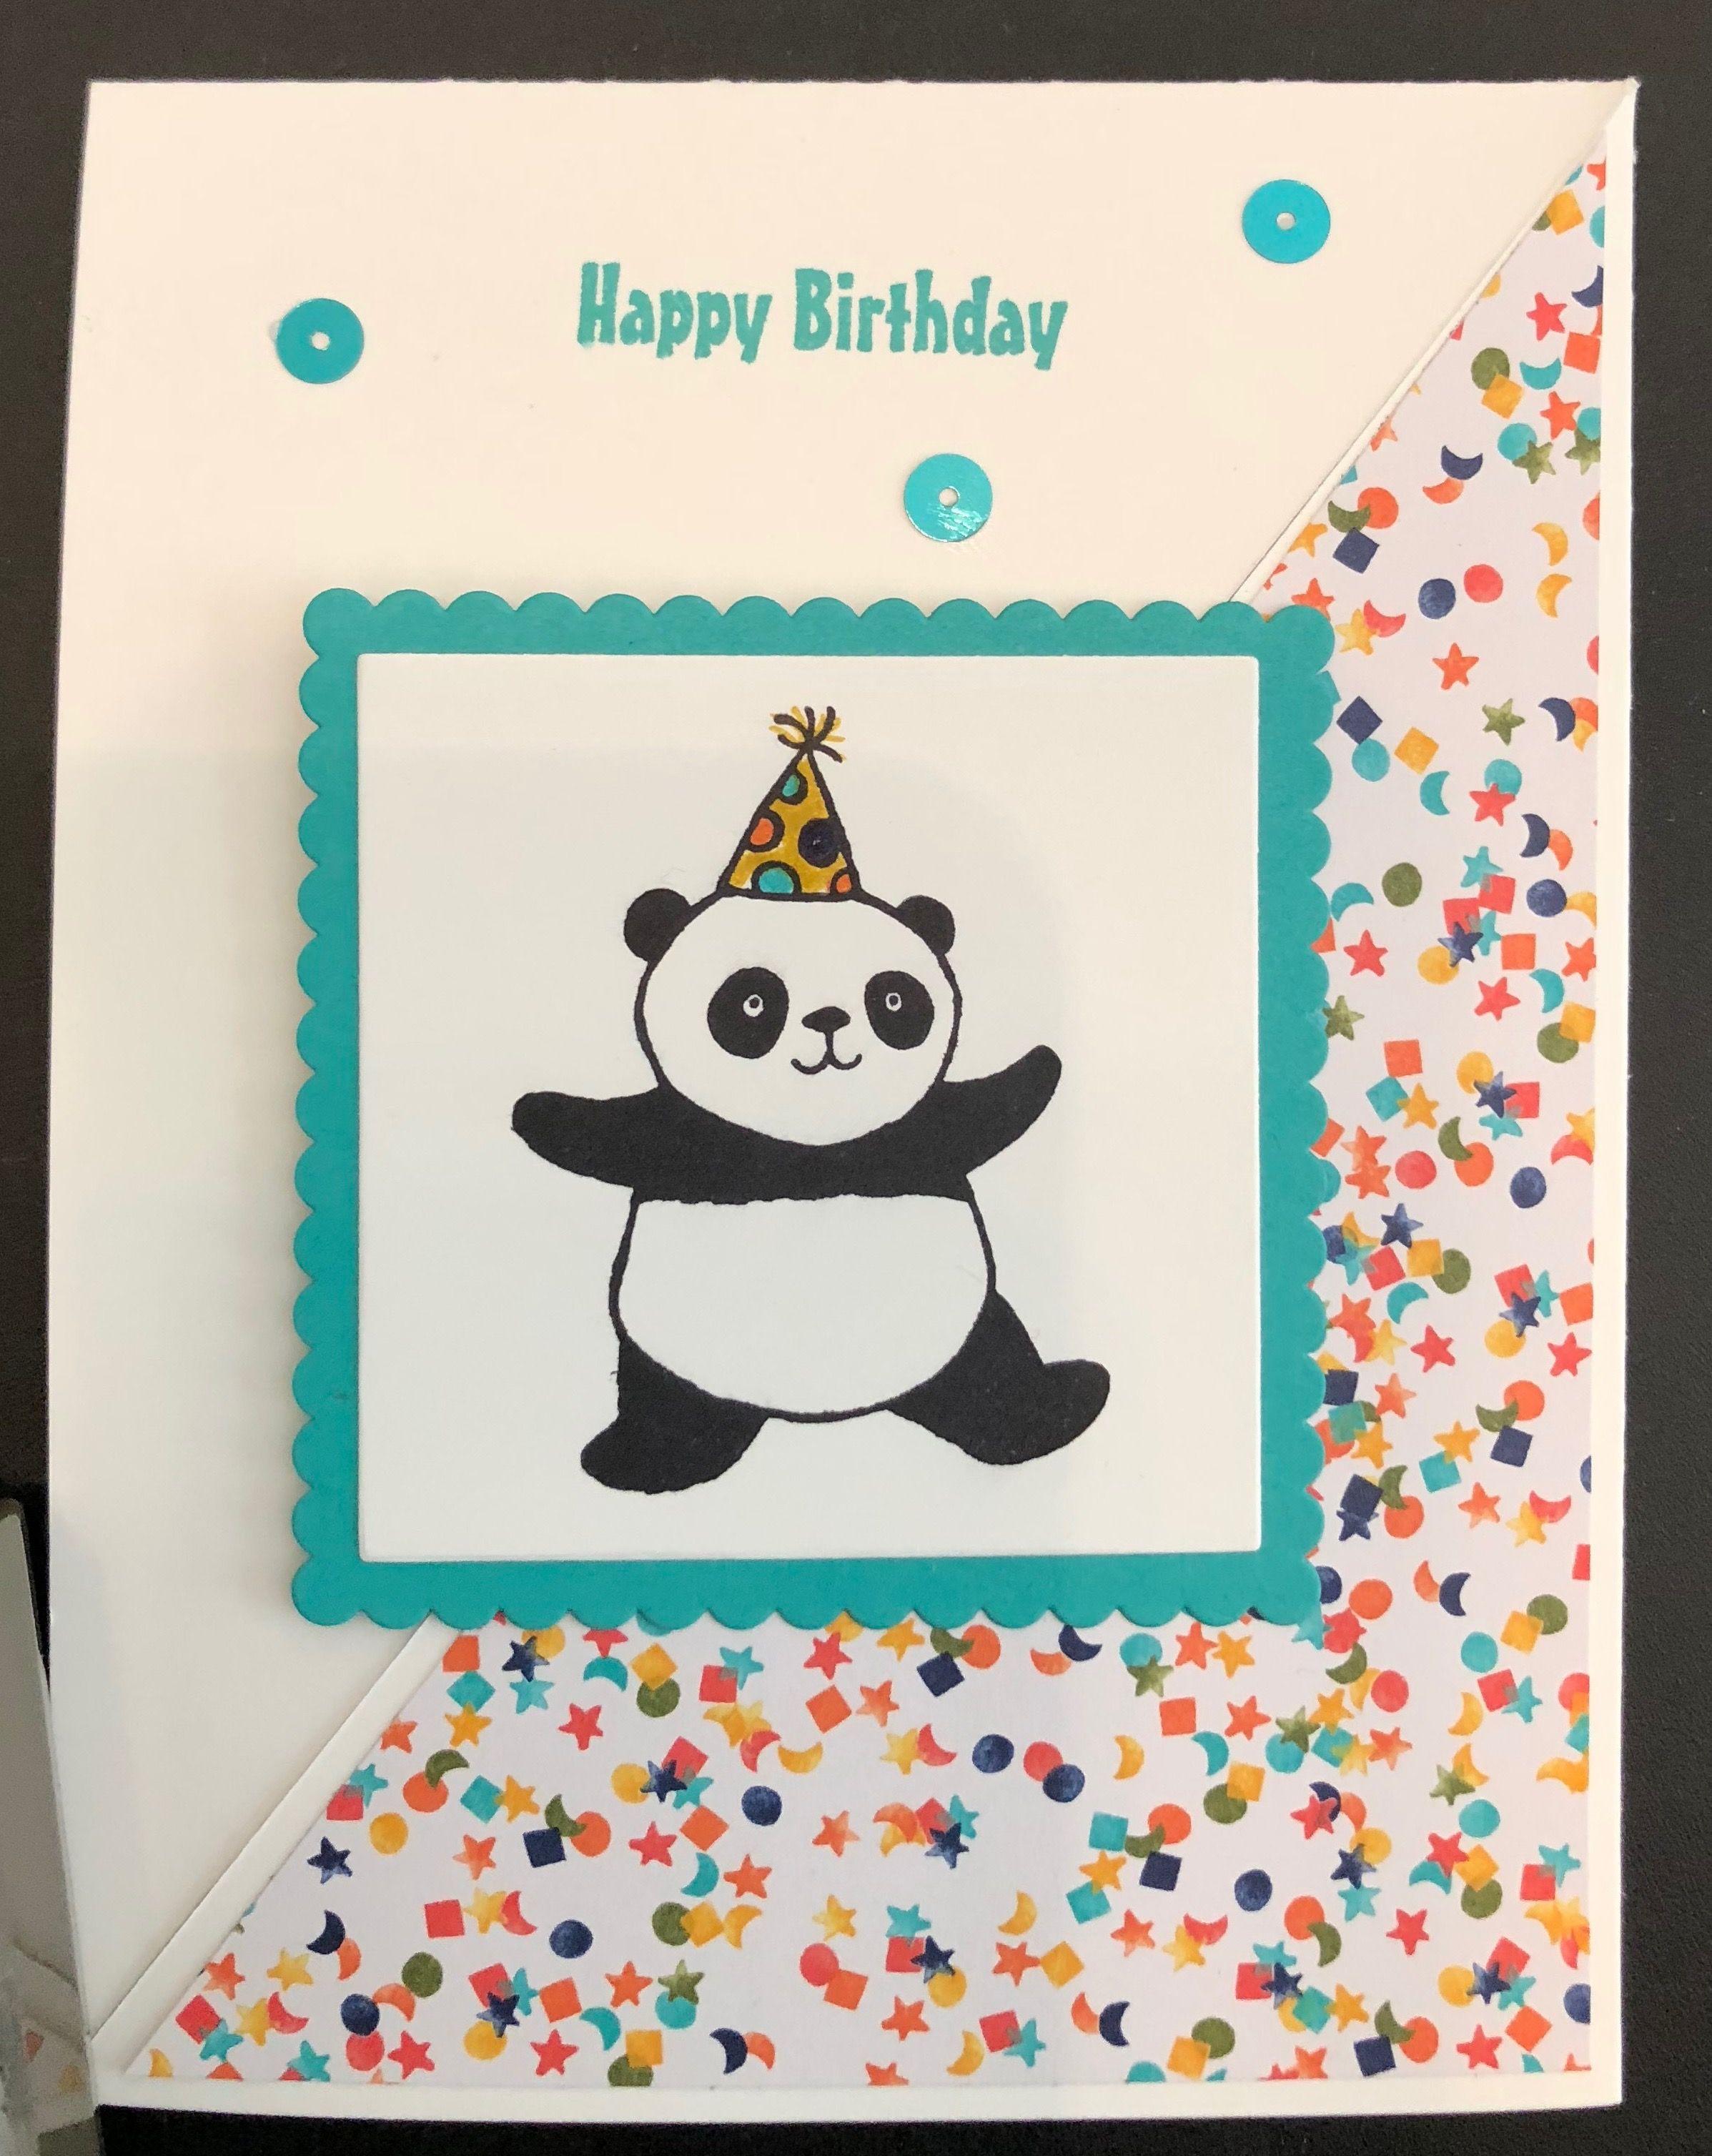 Party Pandas Birthday Card Panda Card Old Birthday Cards Panda Birthday Cards